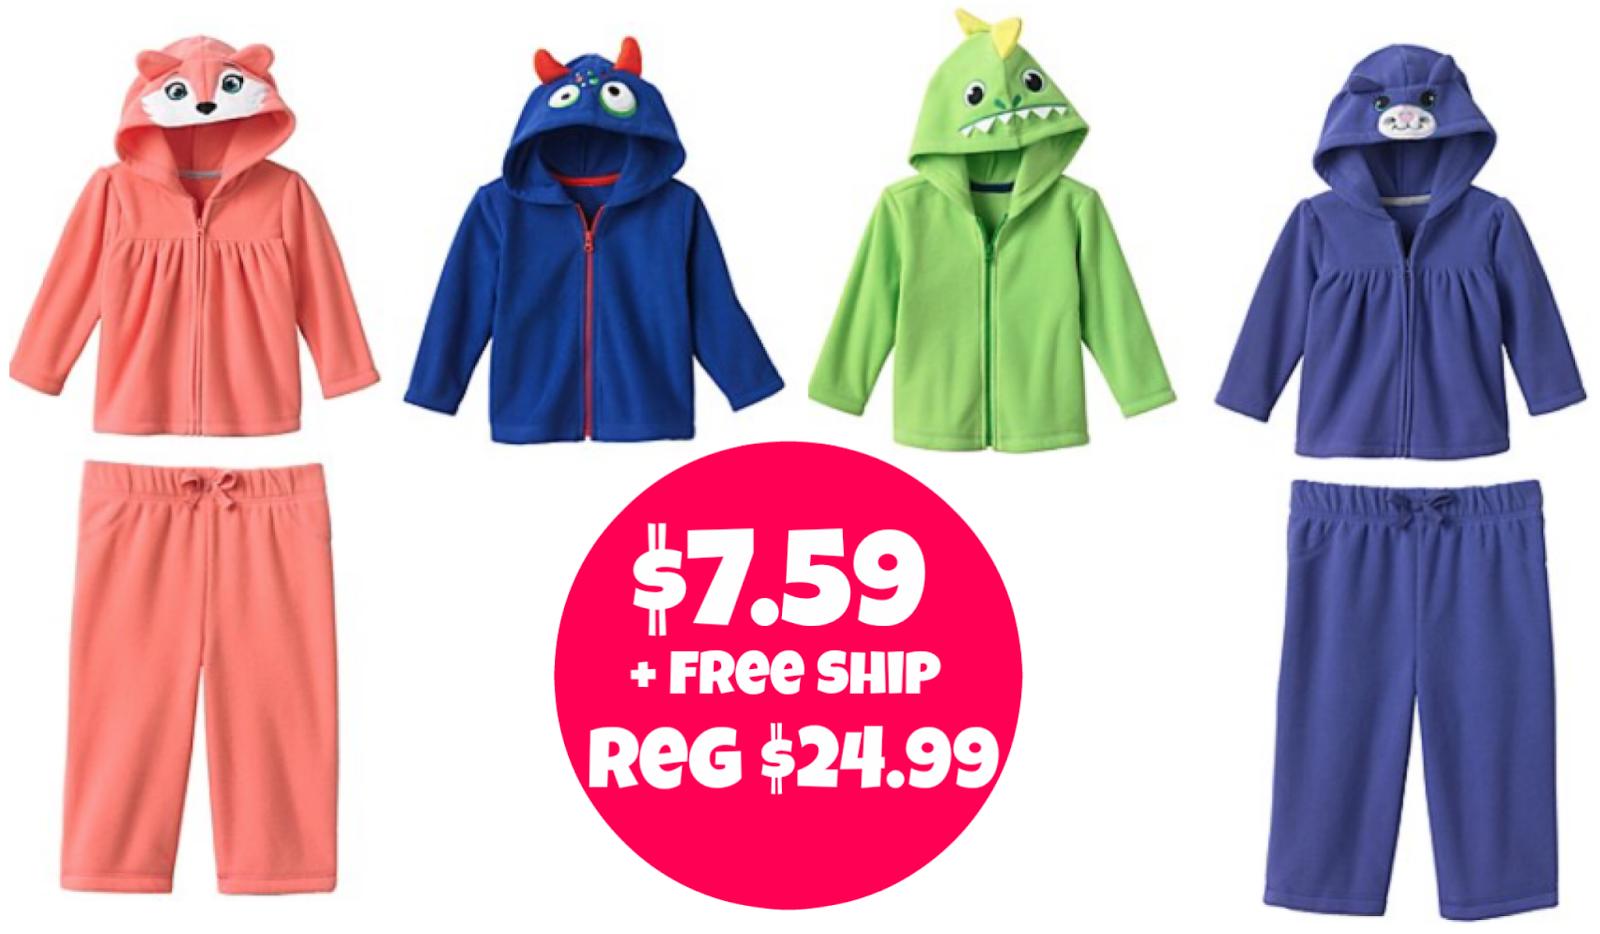 http://www.thebinderladies.com/2015/01/bonton-cuddle-bear-baby-hoodies-just.html#.VK18sYfduyM